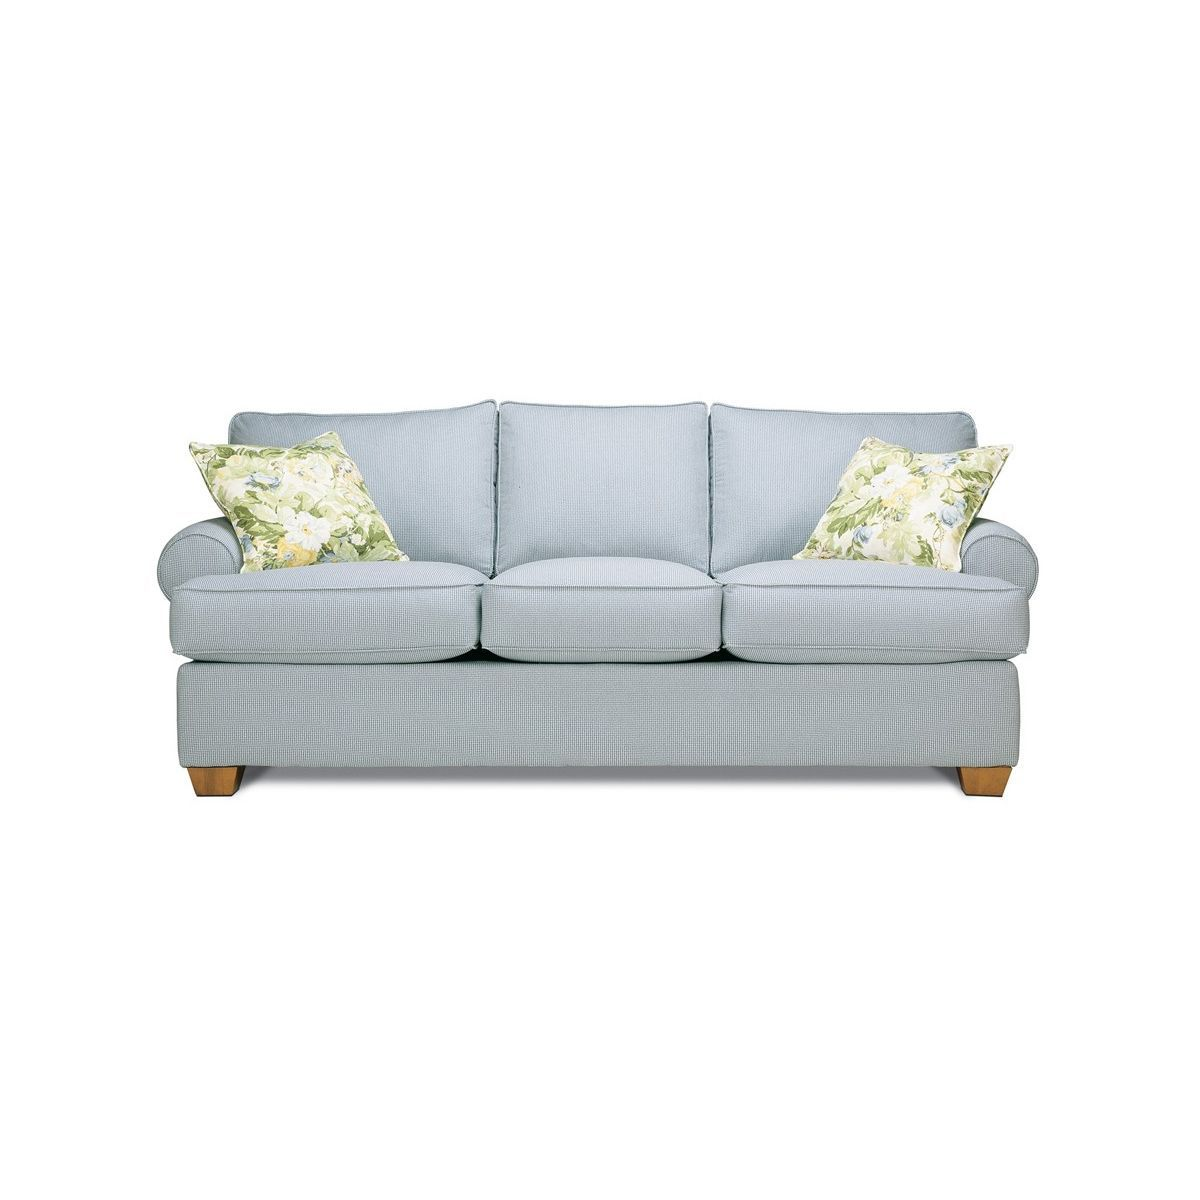 Sofa Sleeper For Cabin Sectional Couch Queen Muebles Modernos De Sala Pinterest